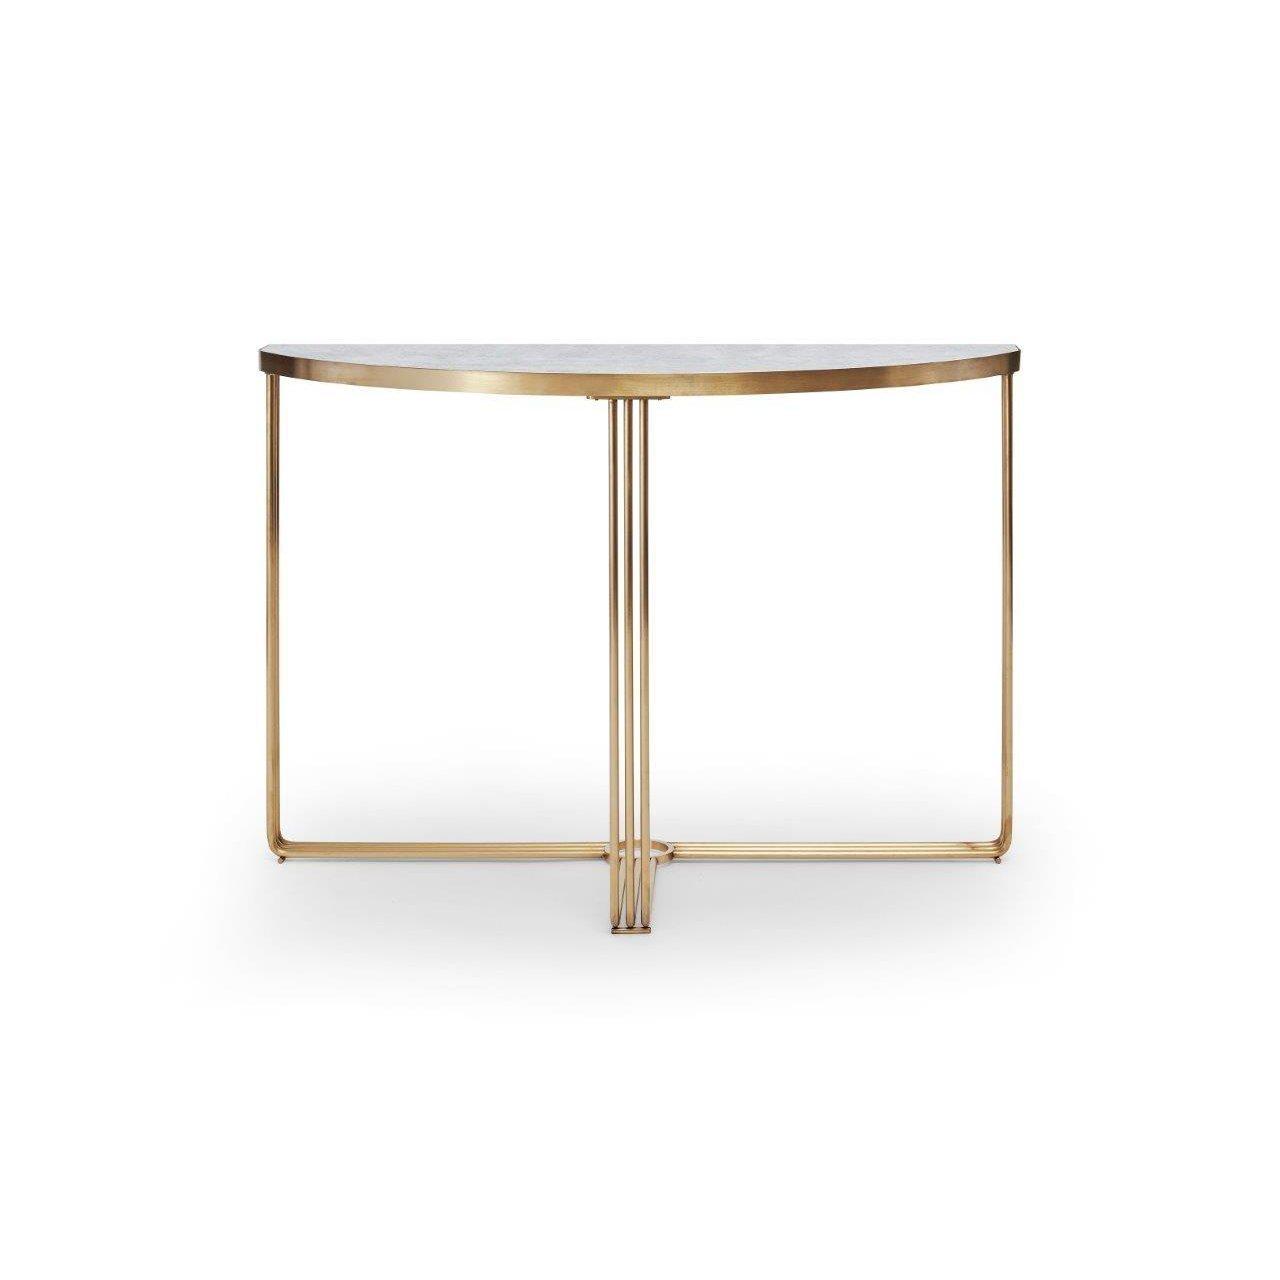 image-Finn (brass) Demi Lune console table - Pale stone